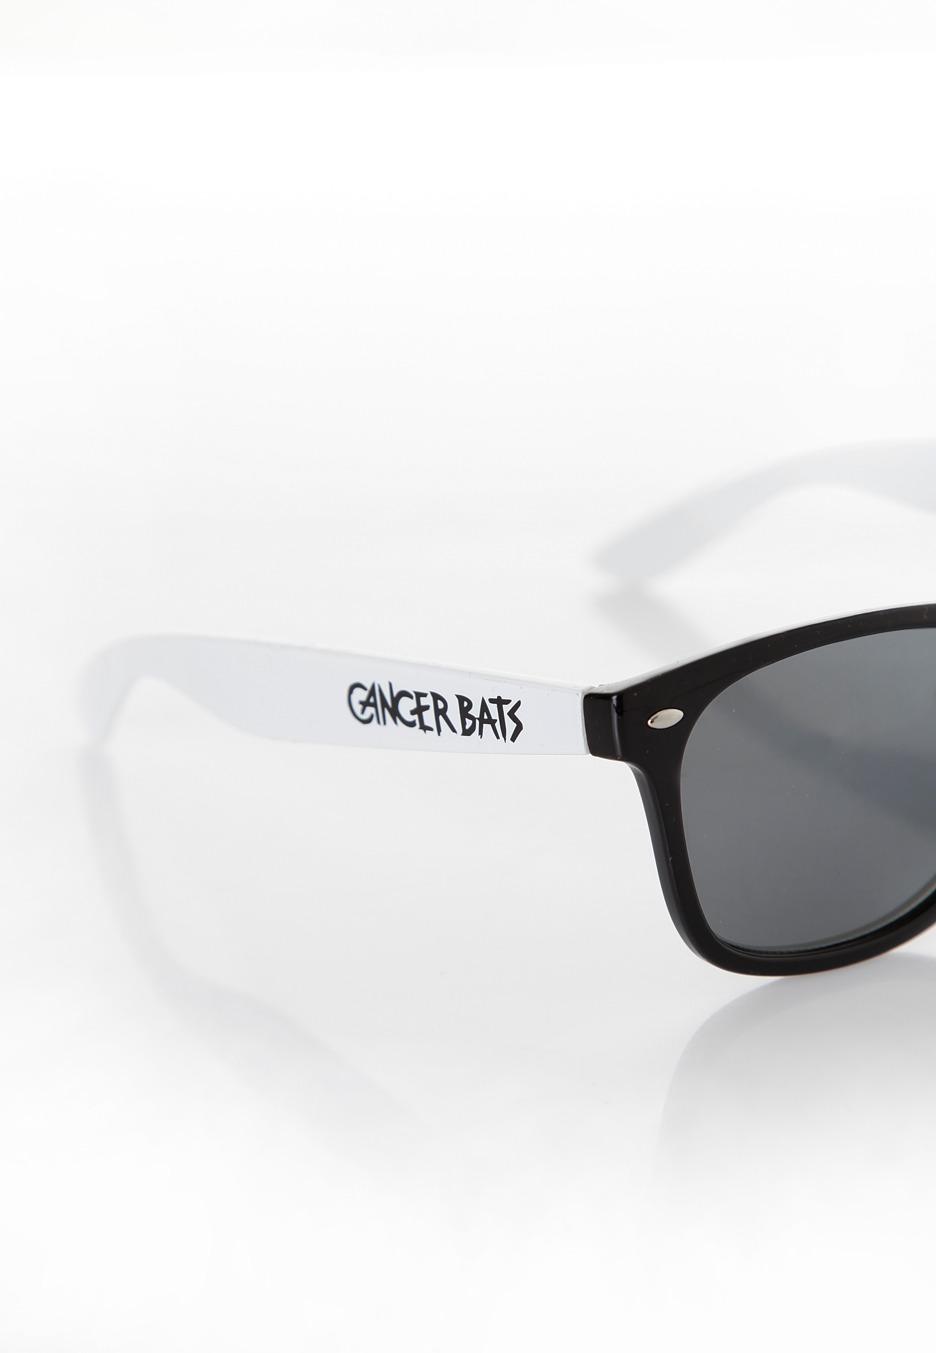 Sunglasses Logo Black And White Cancer Bats - L...